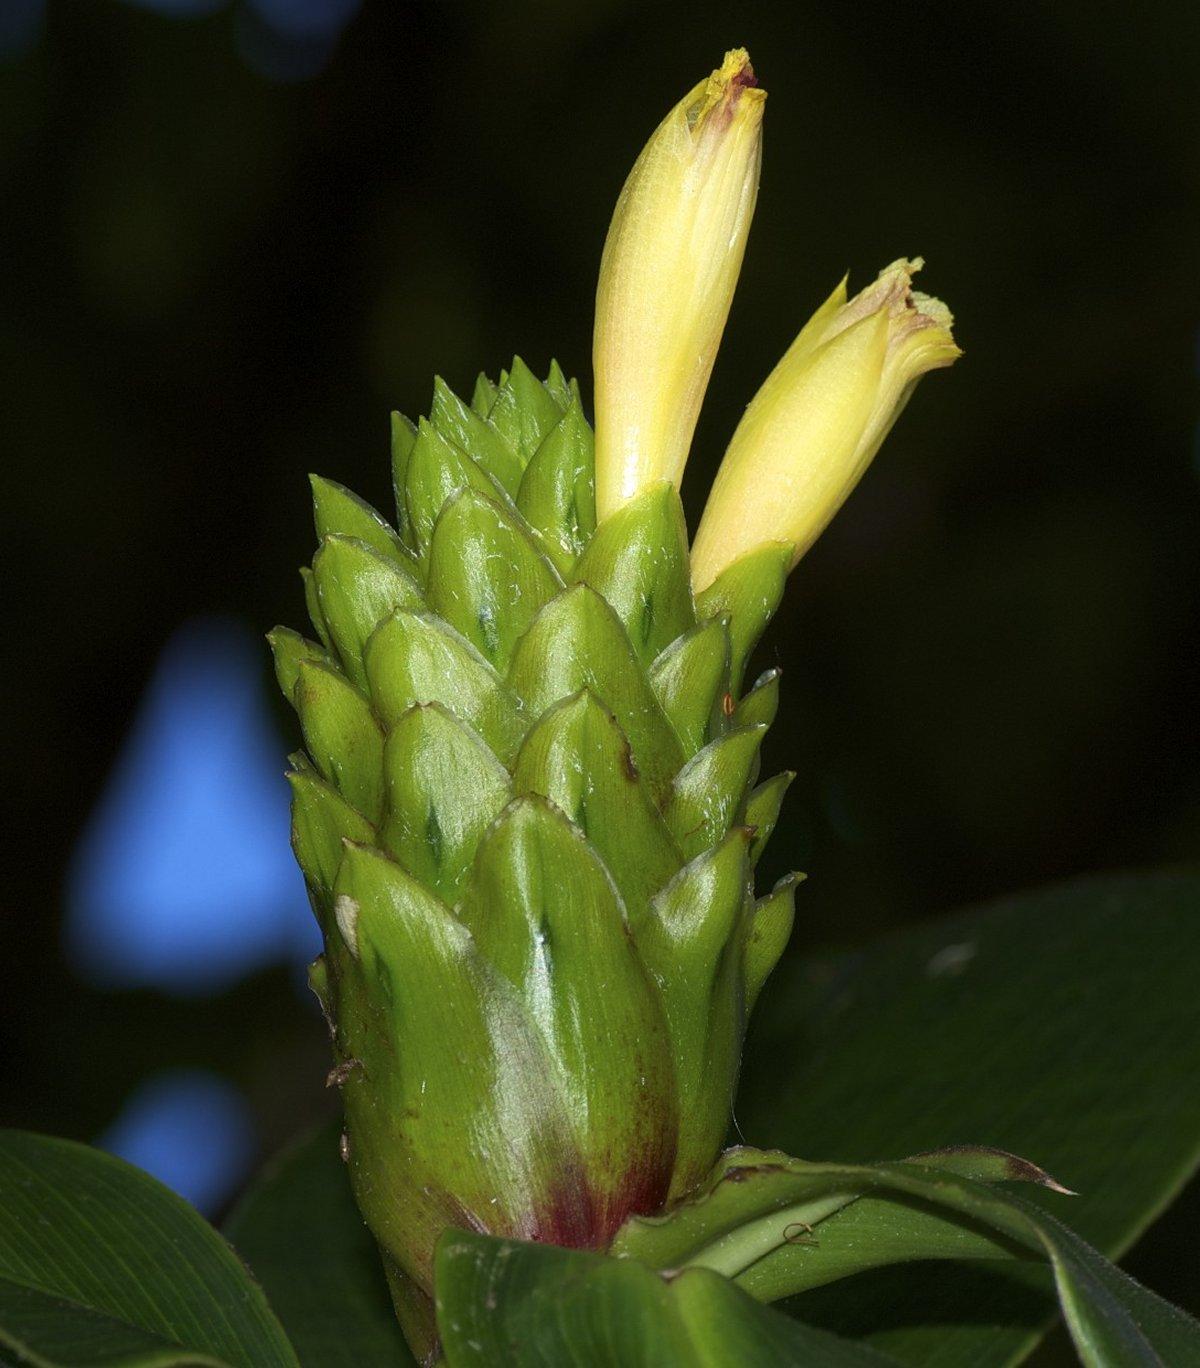 Photo# 16232 - Costus aff. guanaiensis from Reserva Bilsa, at John Mood garden